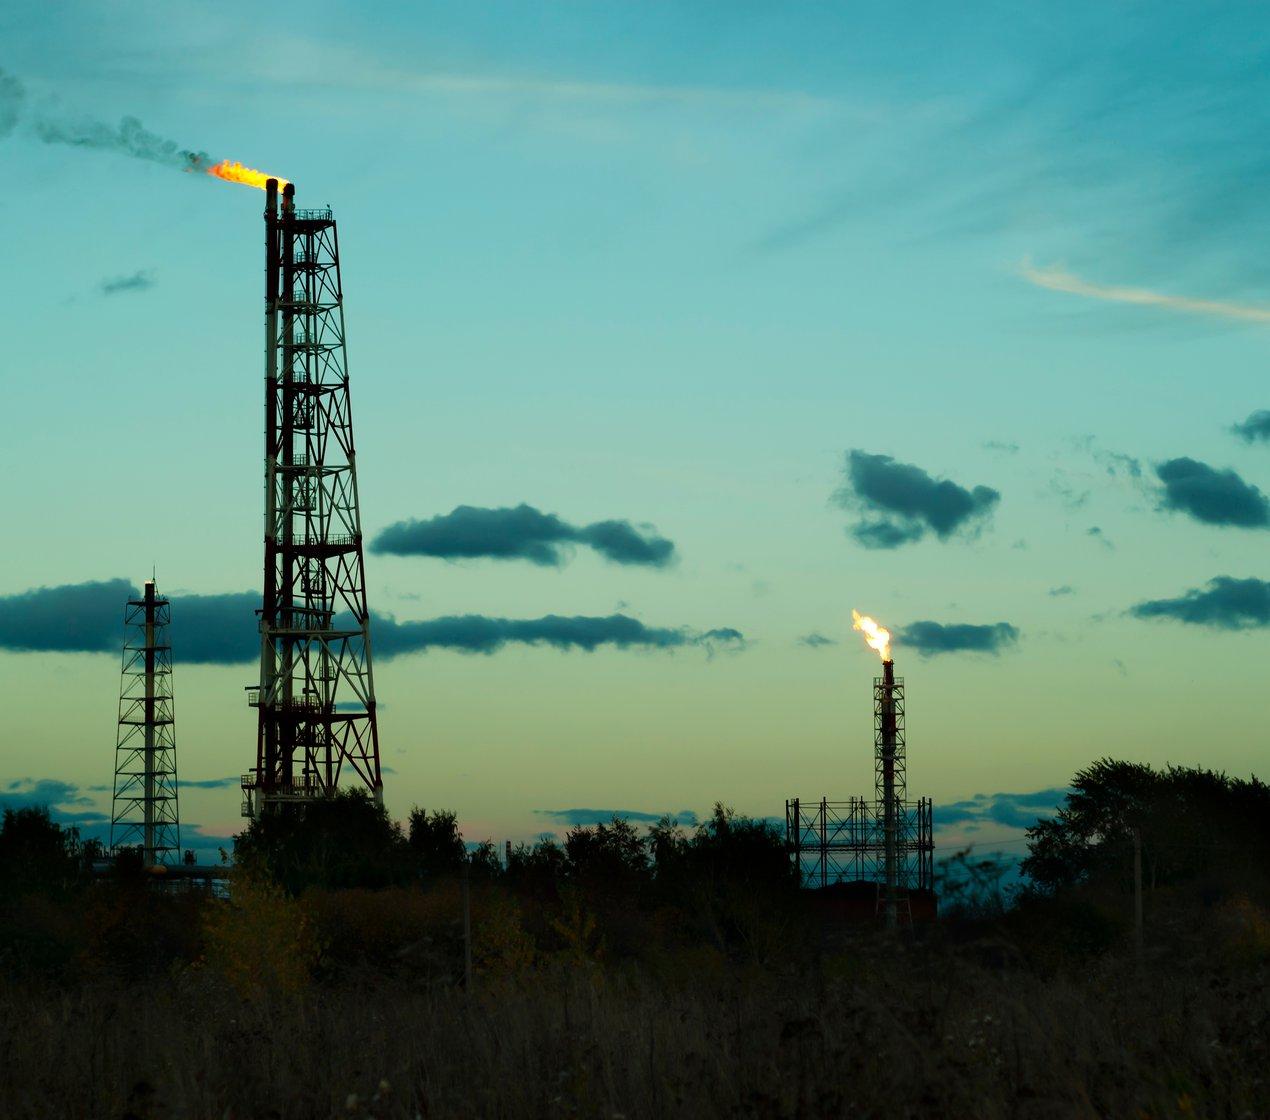 oti methane 7.01.21.jpg